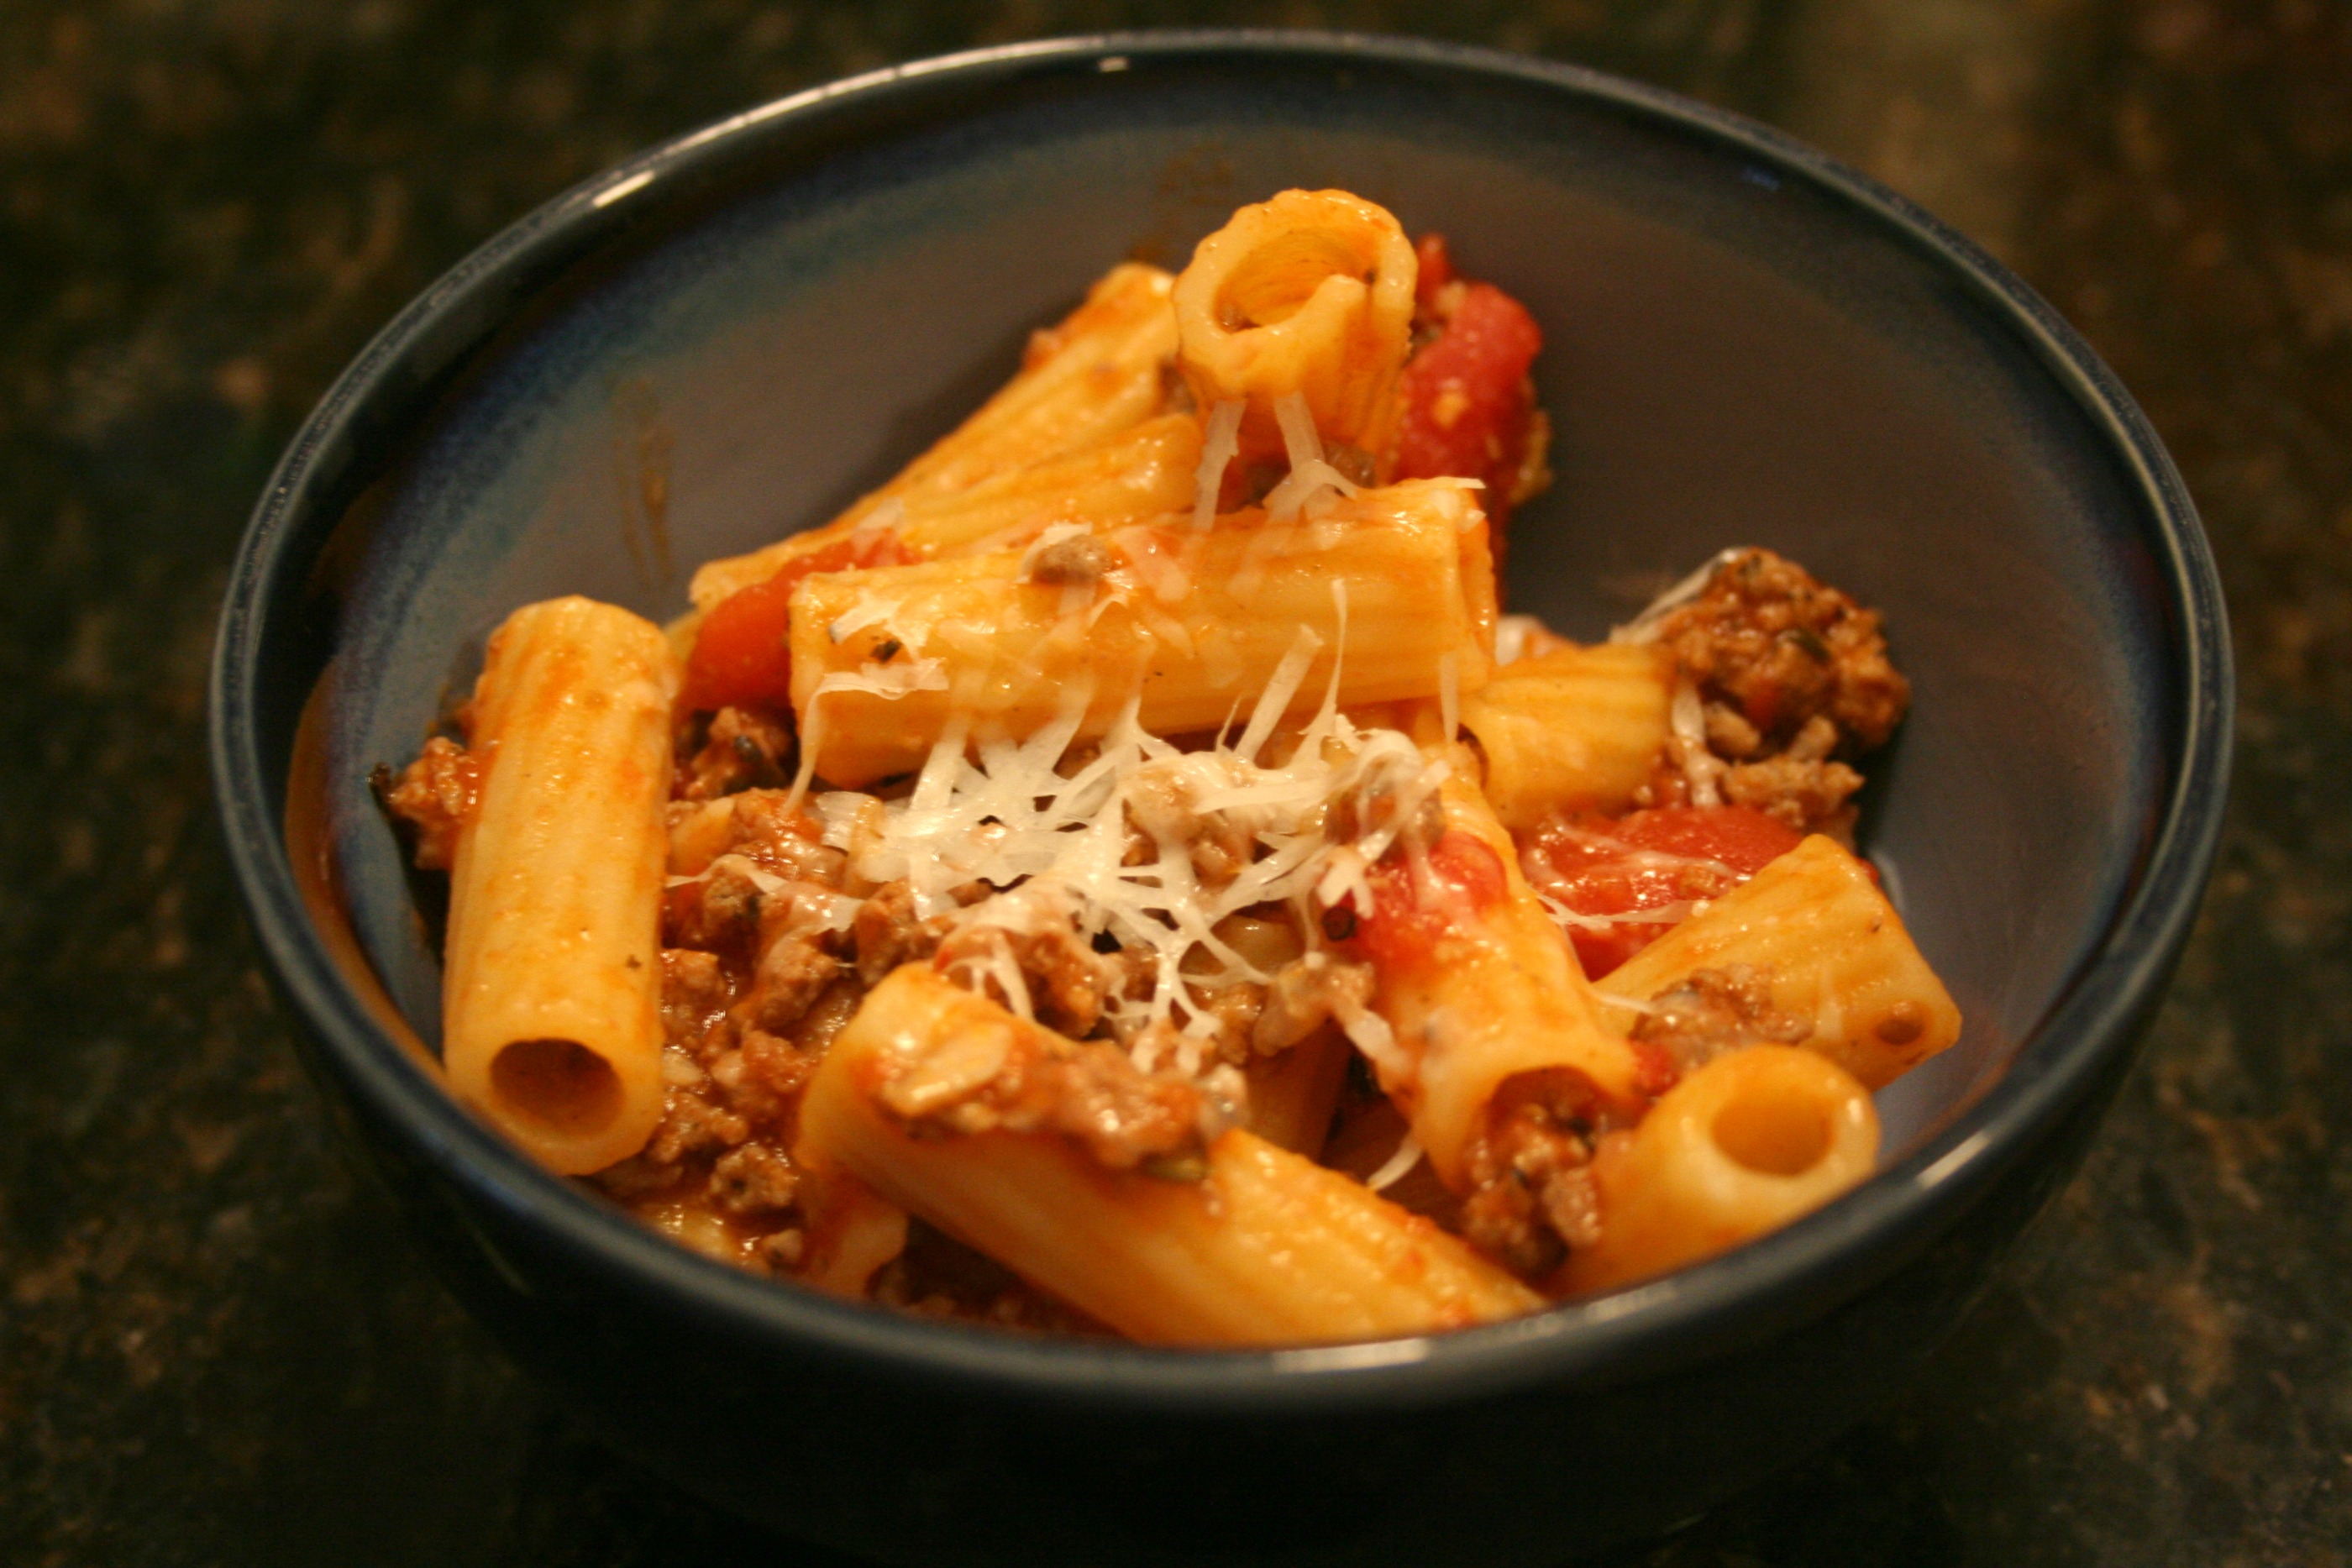 ... man pasta alla it was a great easy pasta pasta alla marlboro man pasta